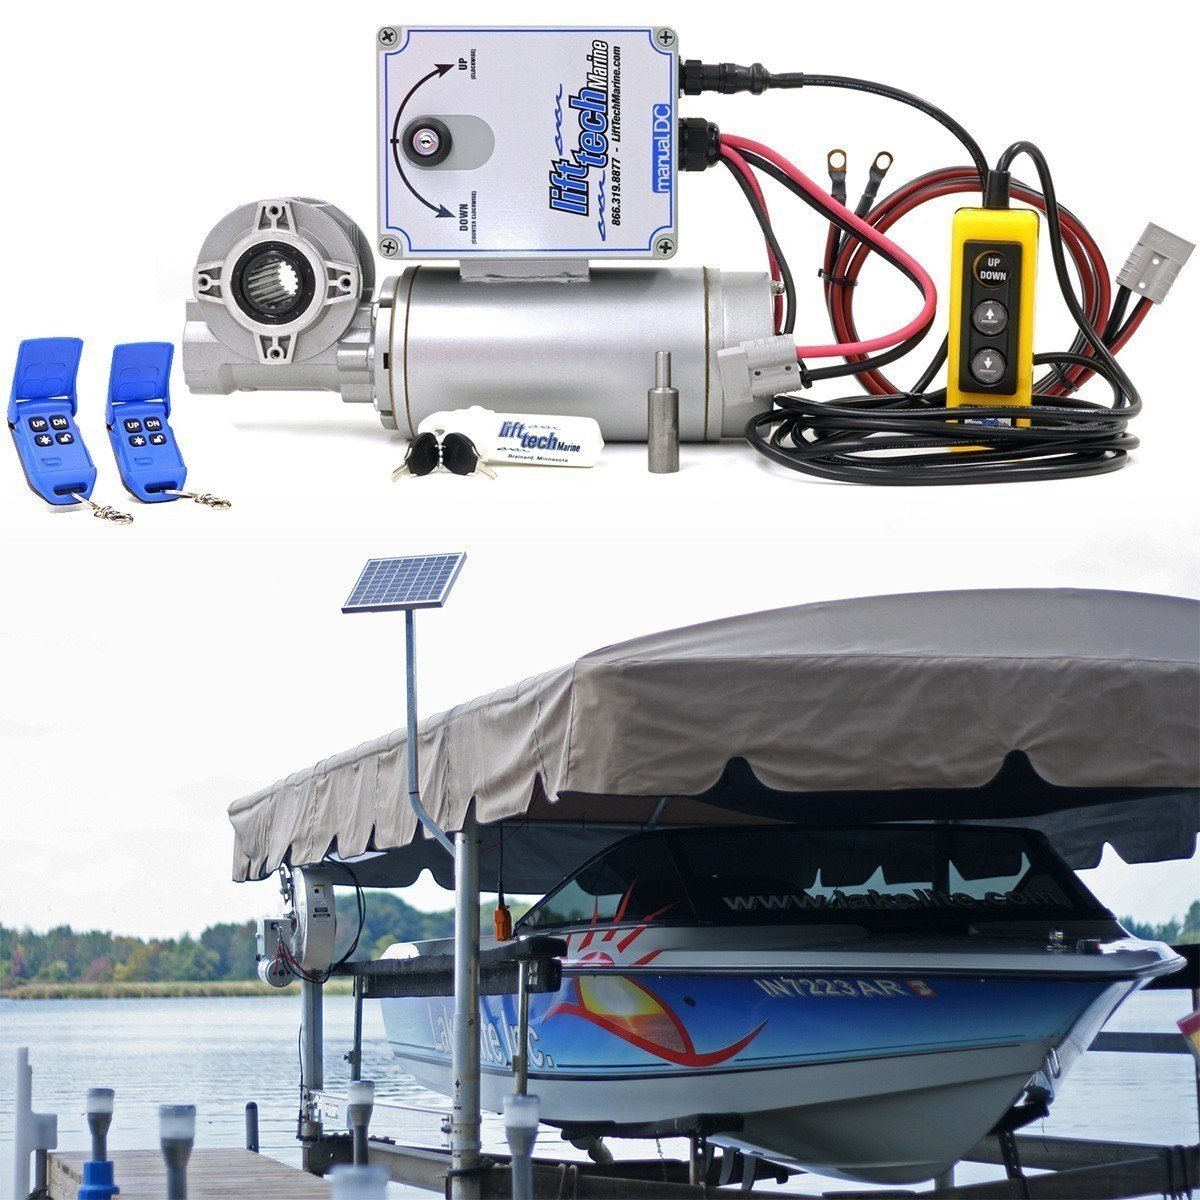 12v Boat Lift Motor 10w 12v Solar Charging System